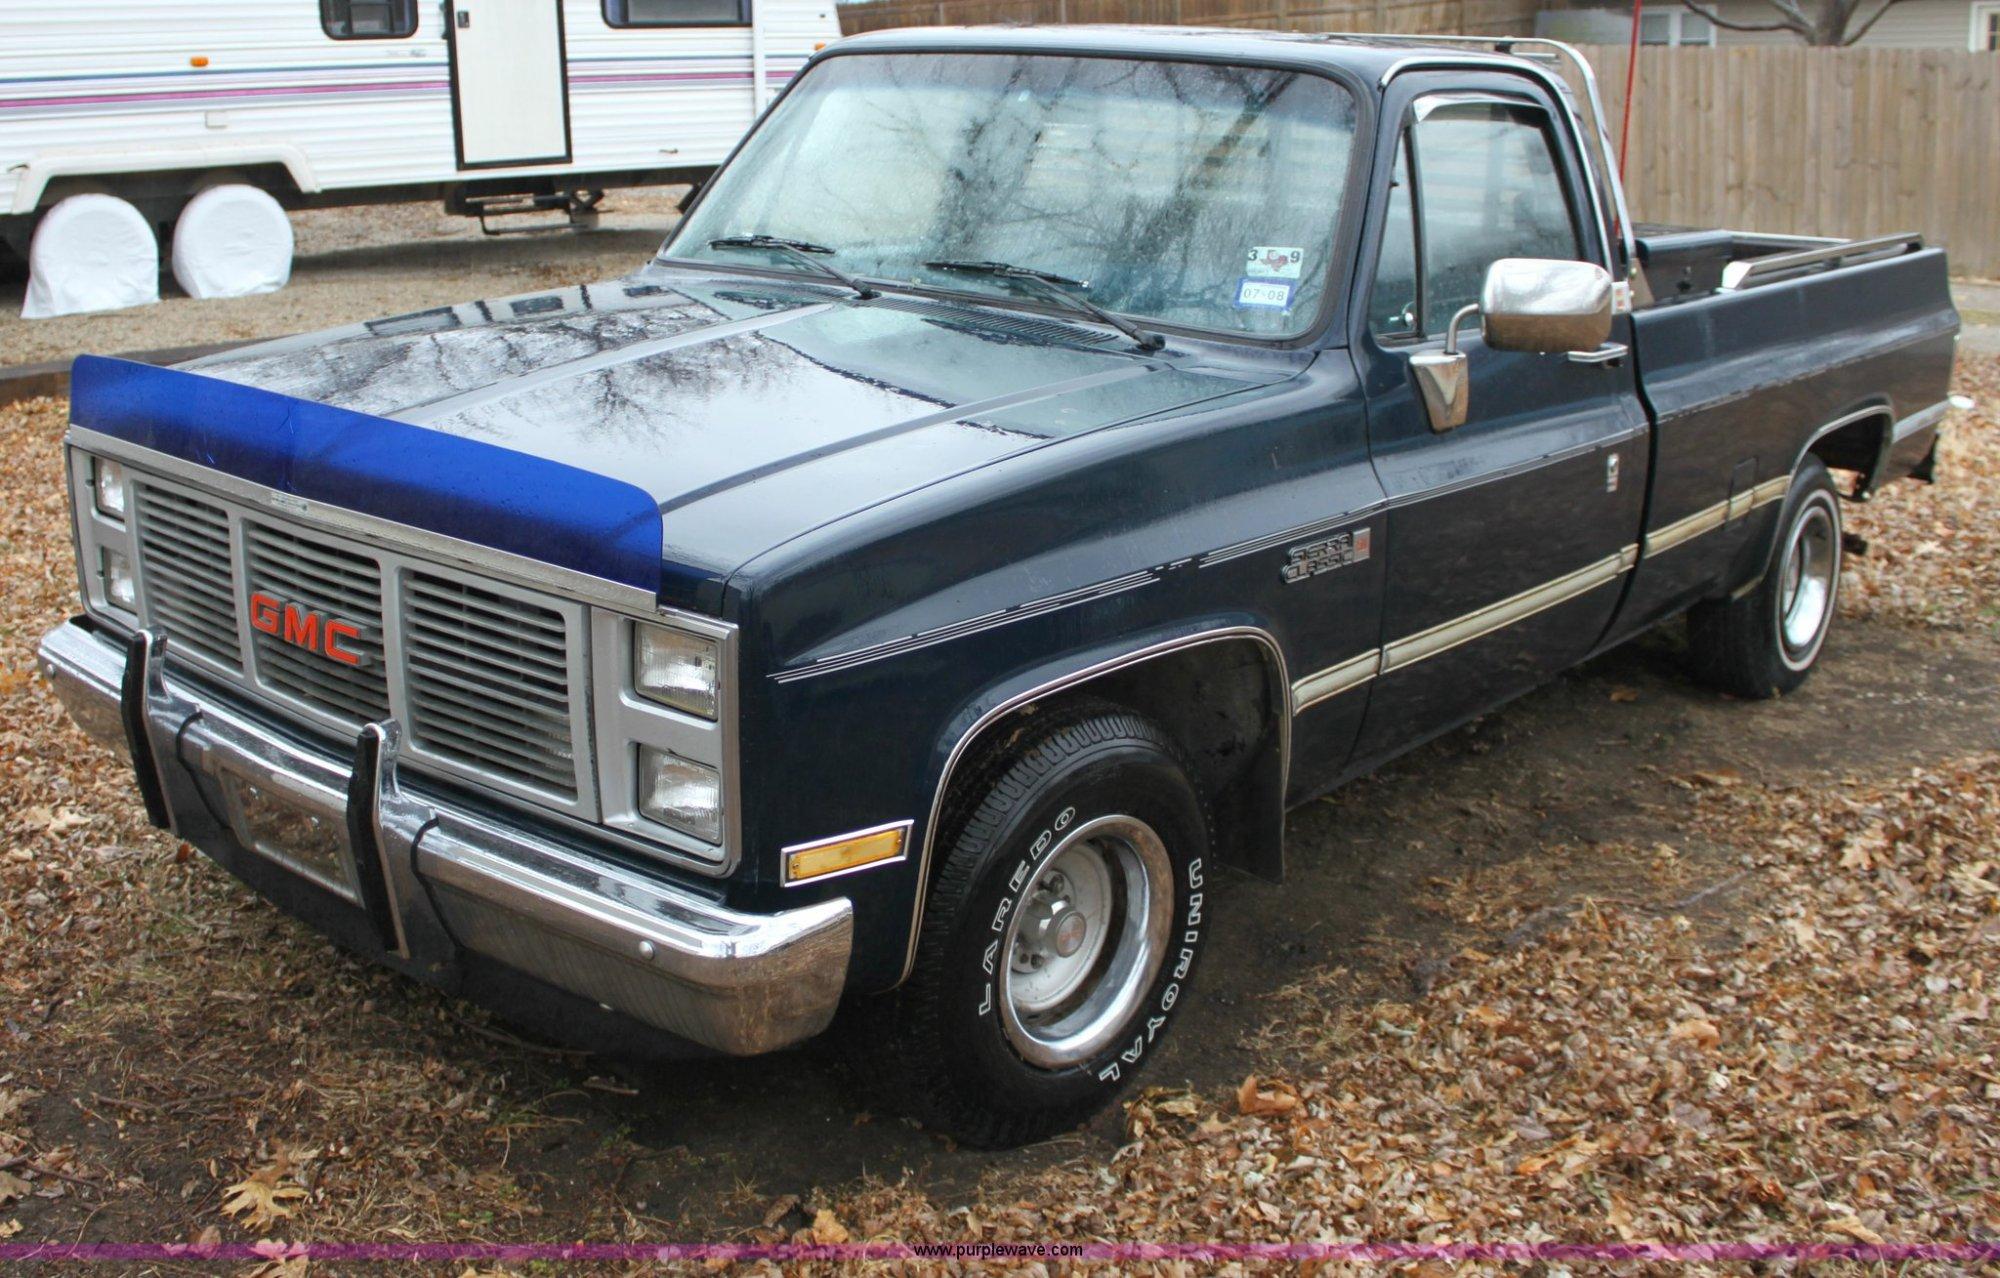 hight resolution of 1985 gmc sierra 1500 classic pickup truck for sale in kansas